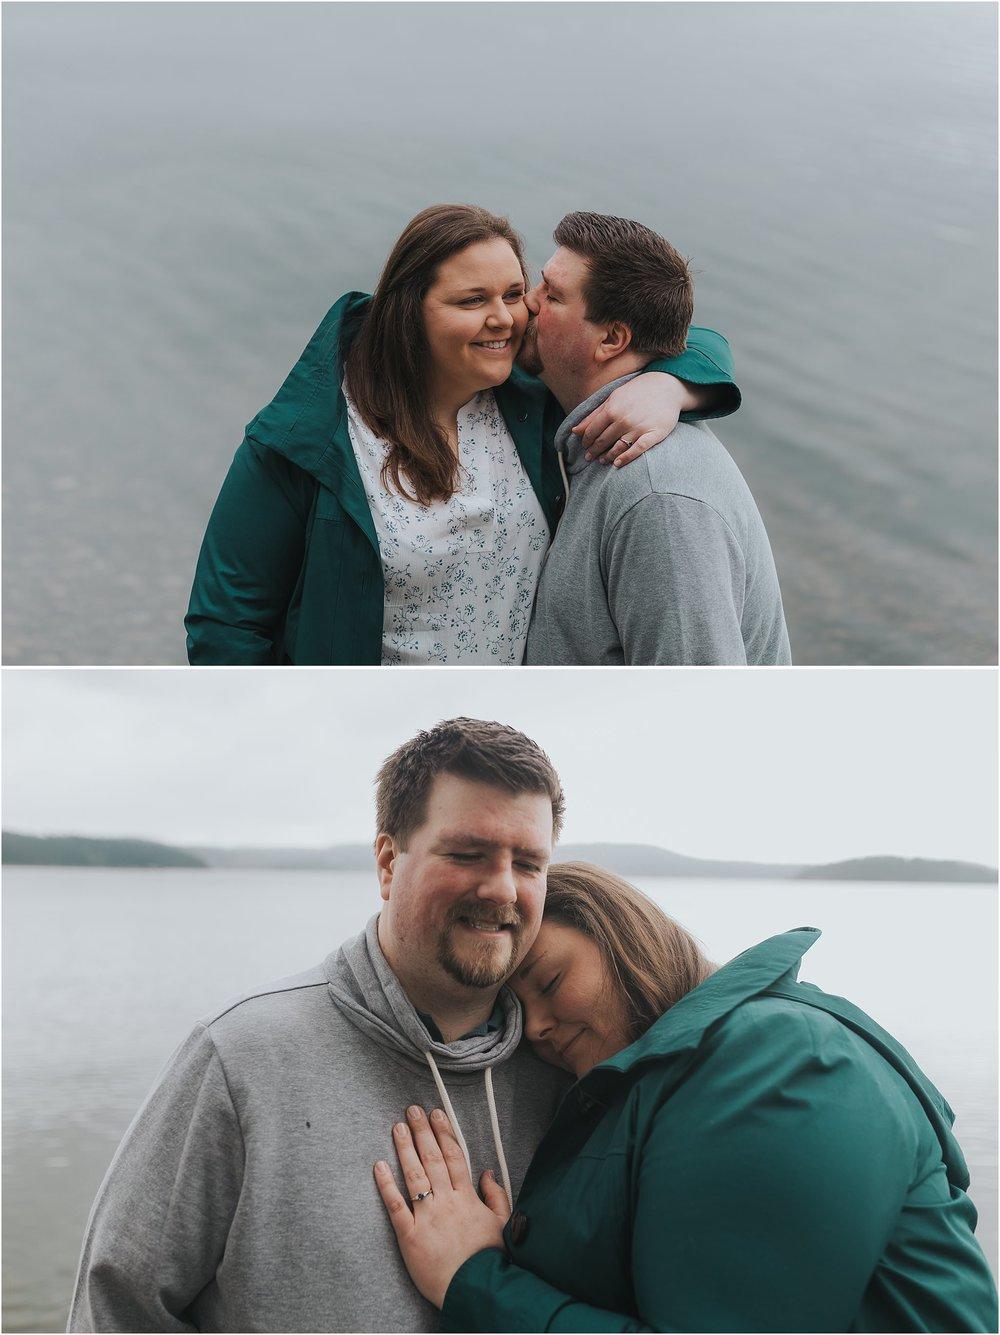 couples.2017.6.jpg